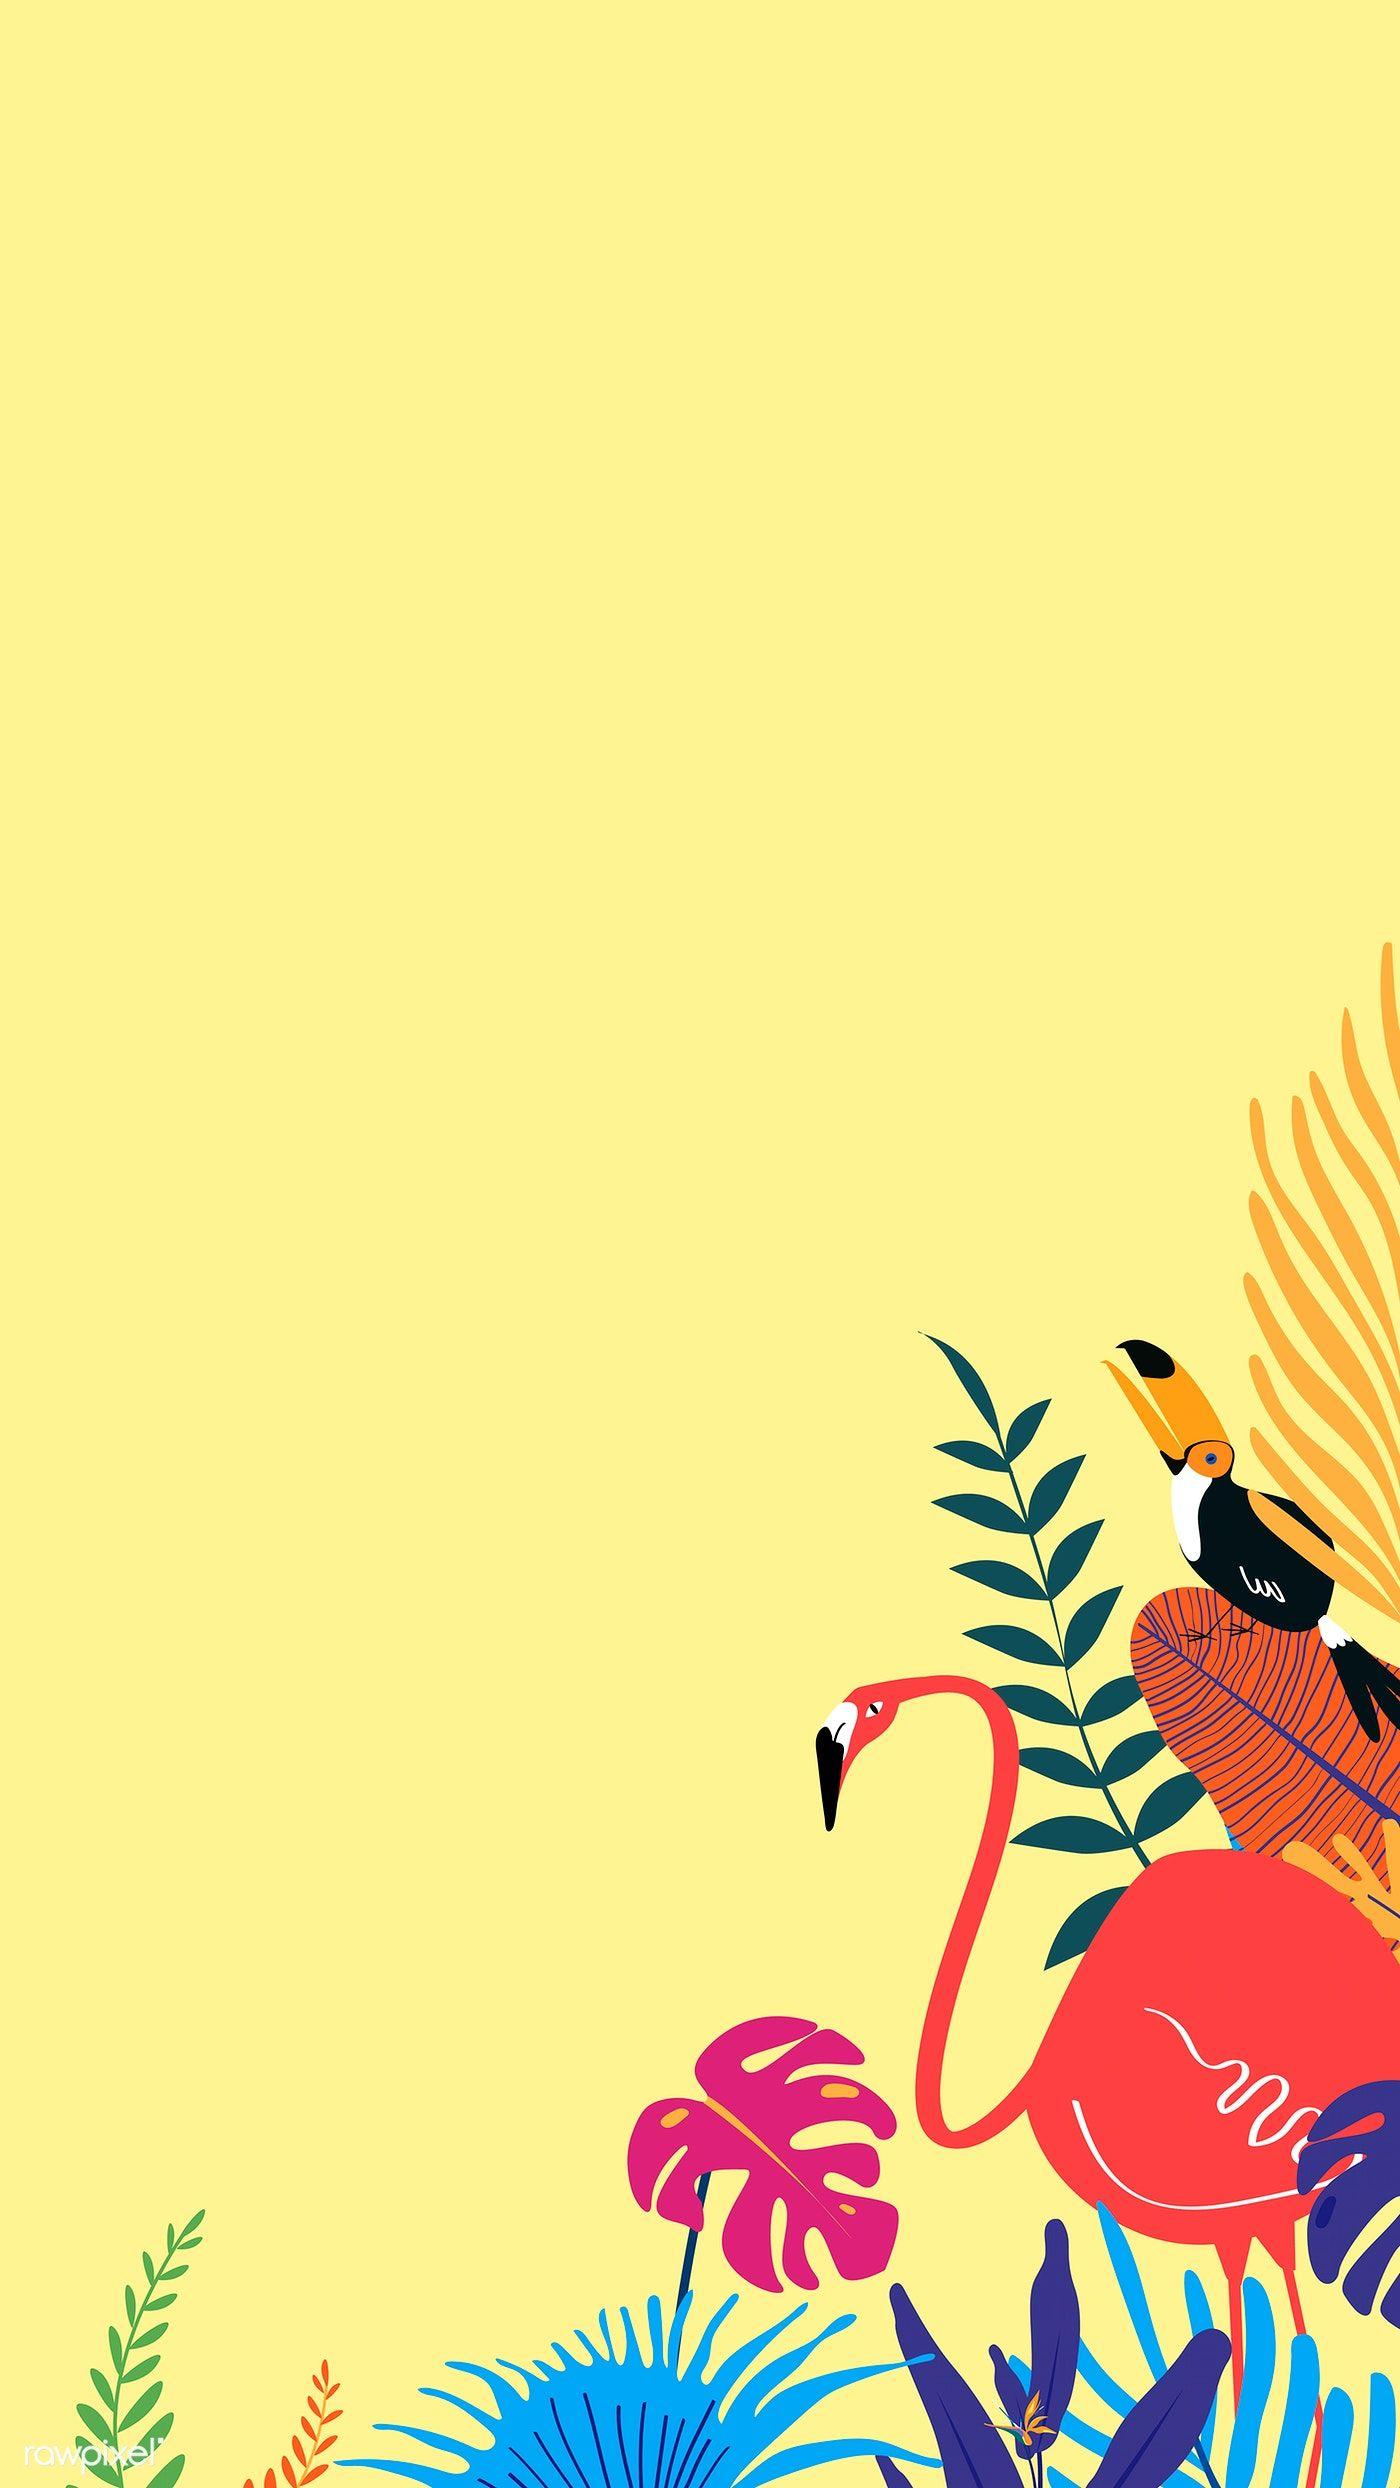 Blank Tropical Yellow Background Vector Free Image By Rawpixel Com Peera Poster Bunga Ilustrasi Foto Abstrak